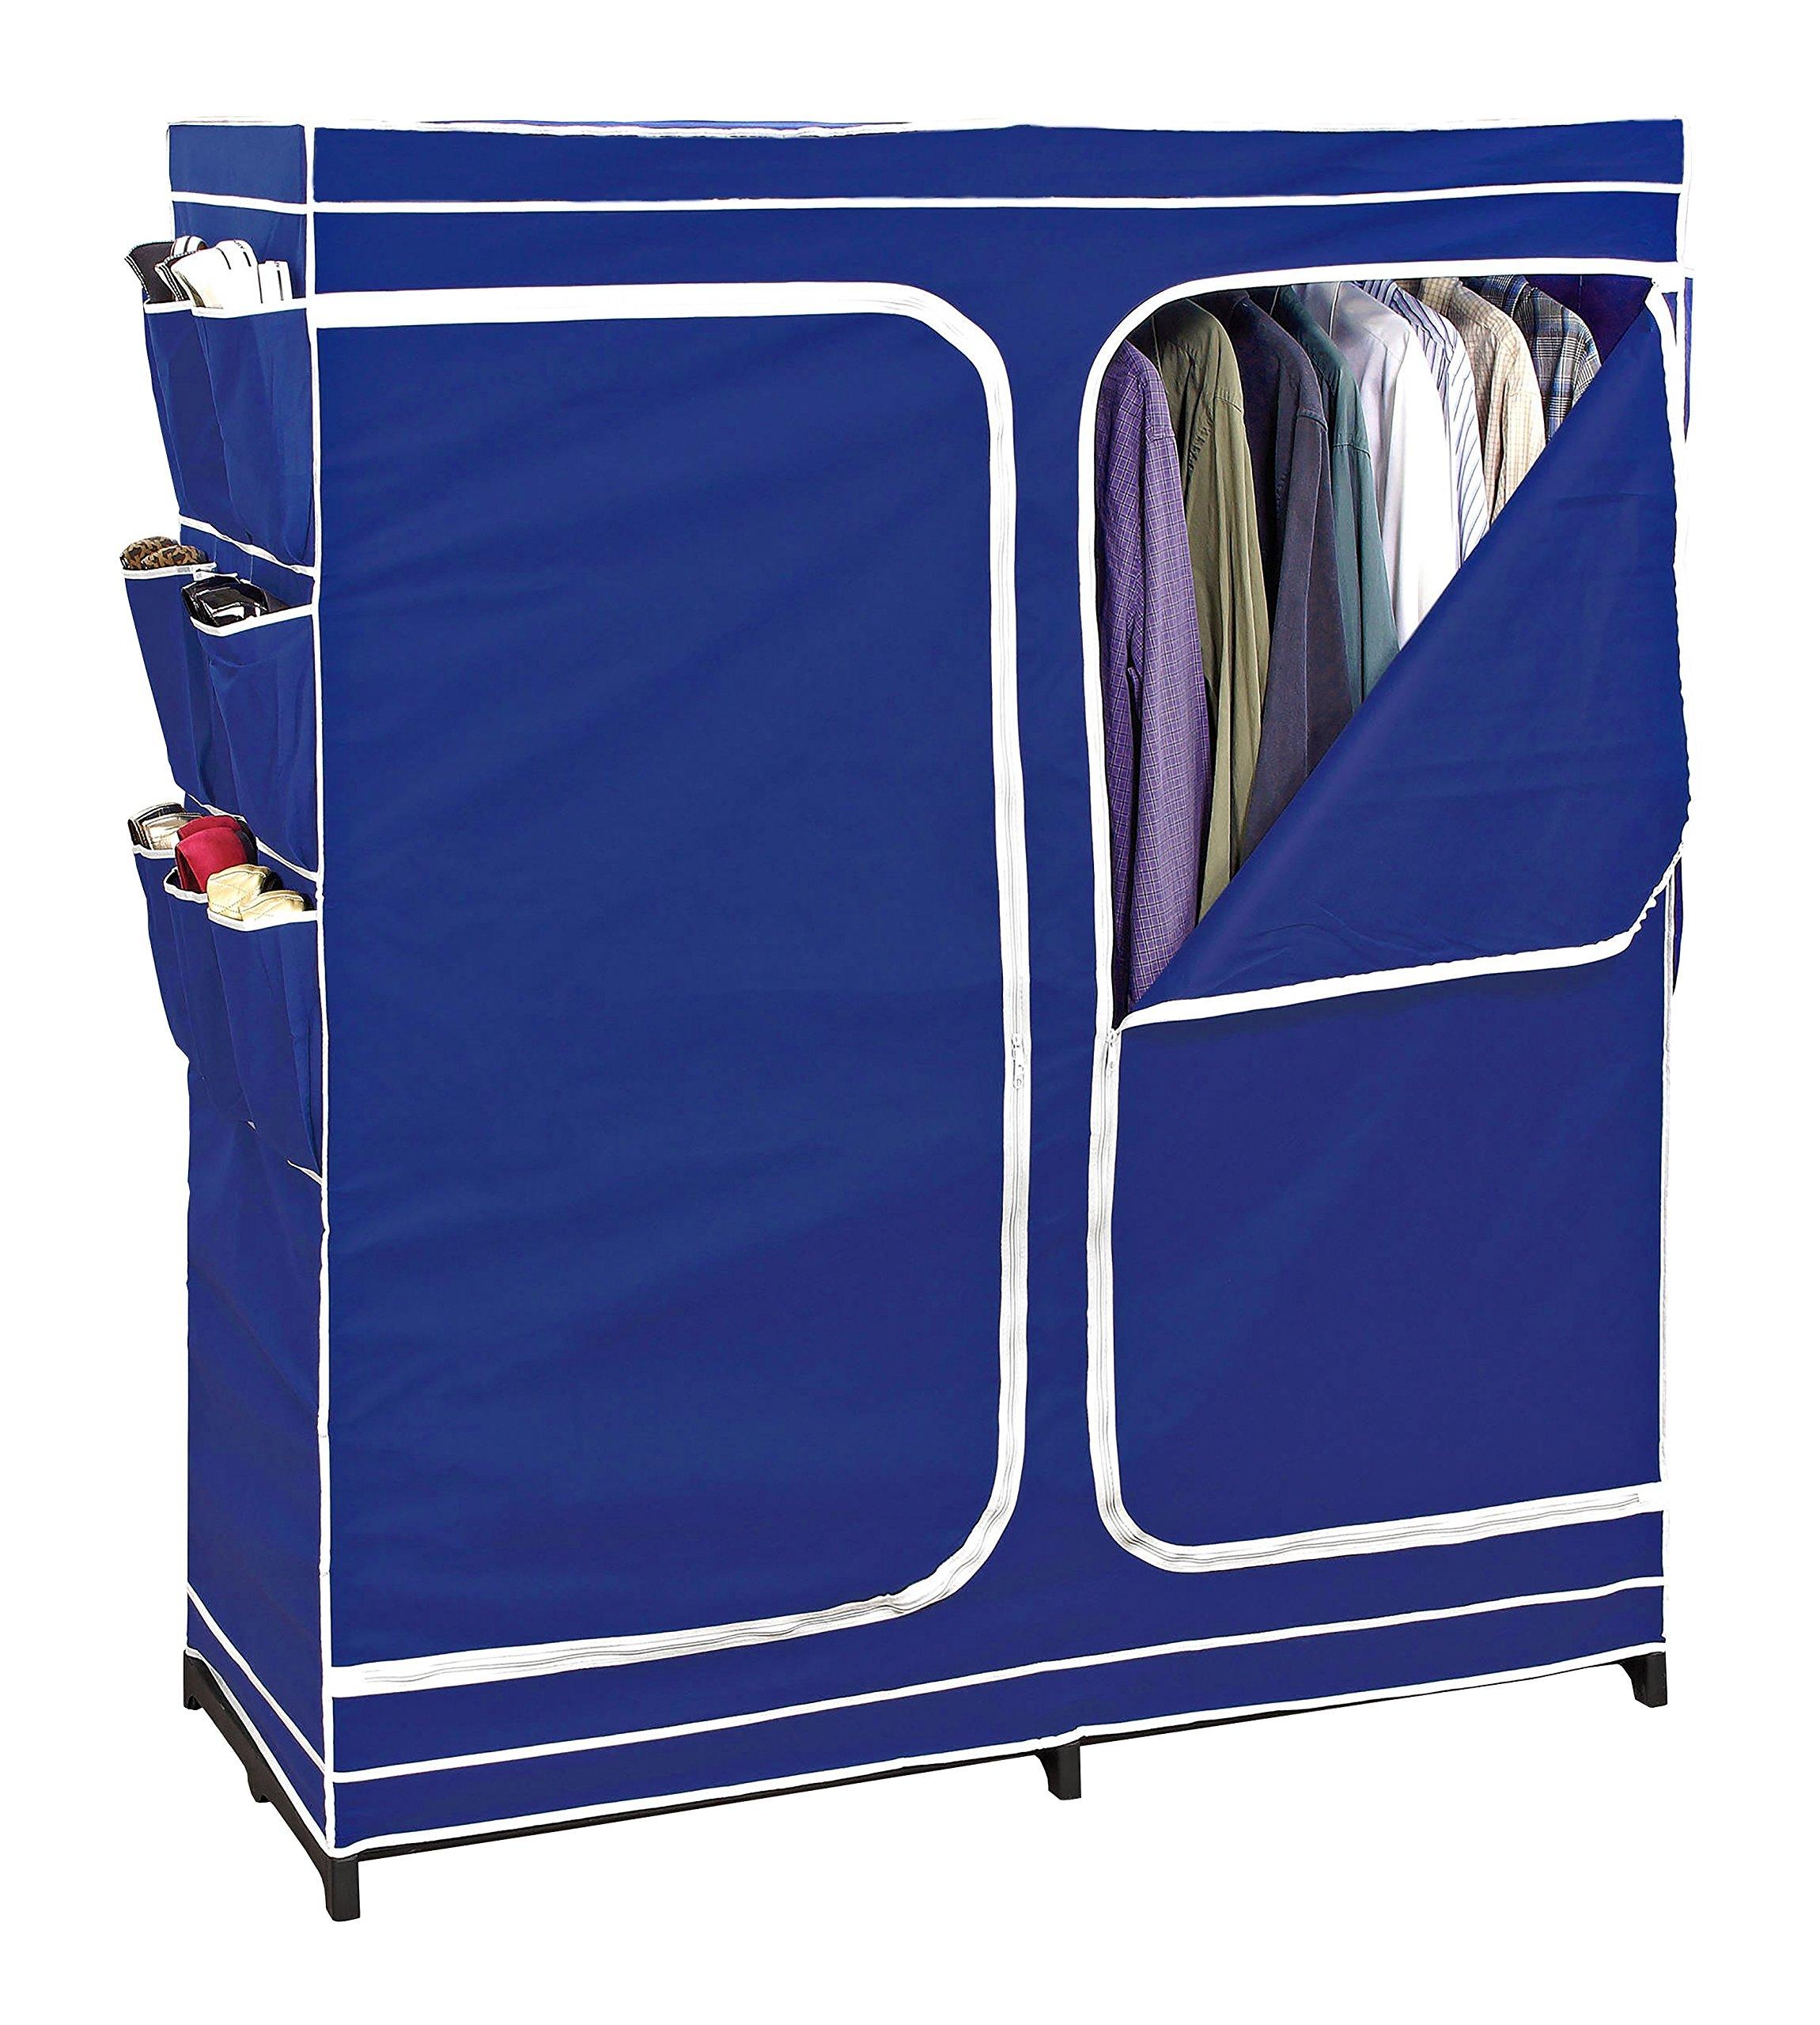 Clothes Closet Double Door Storage Closet Seasonal Storage Unit Wardrobe Organizer Easy Zip, Non Woven Breathable Fabric, Navy, Free Standing Closet, Clothes Closet